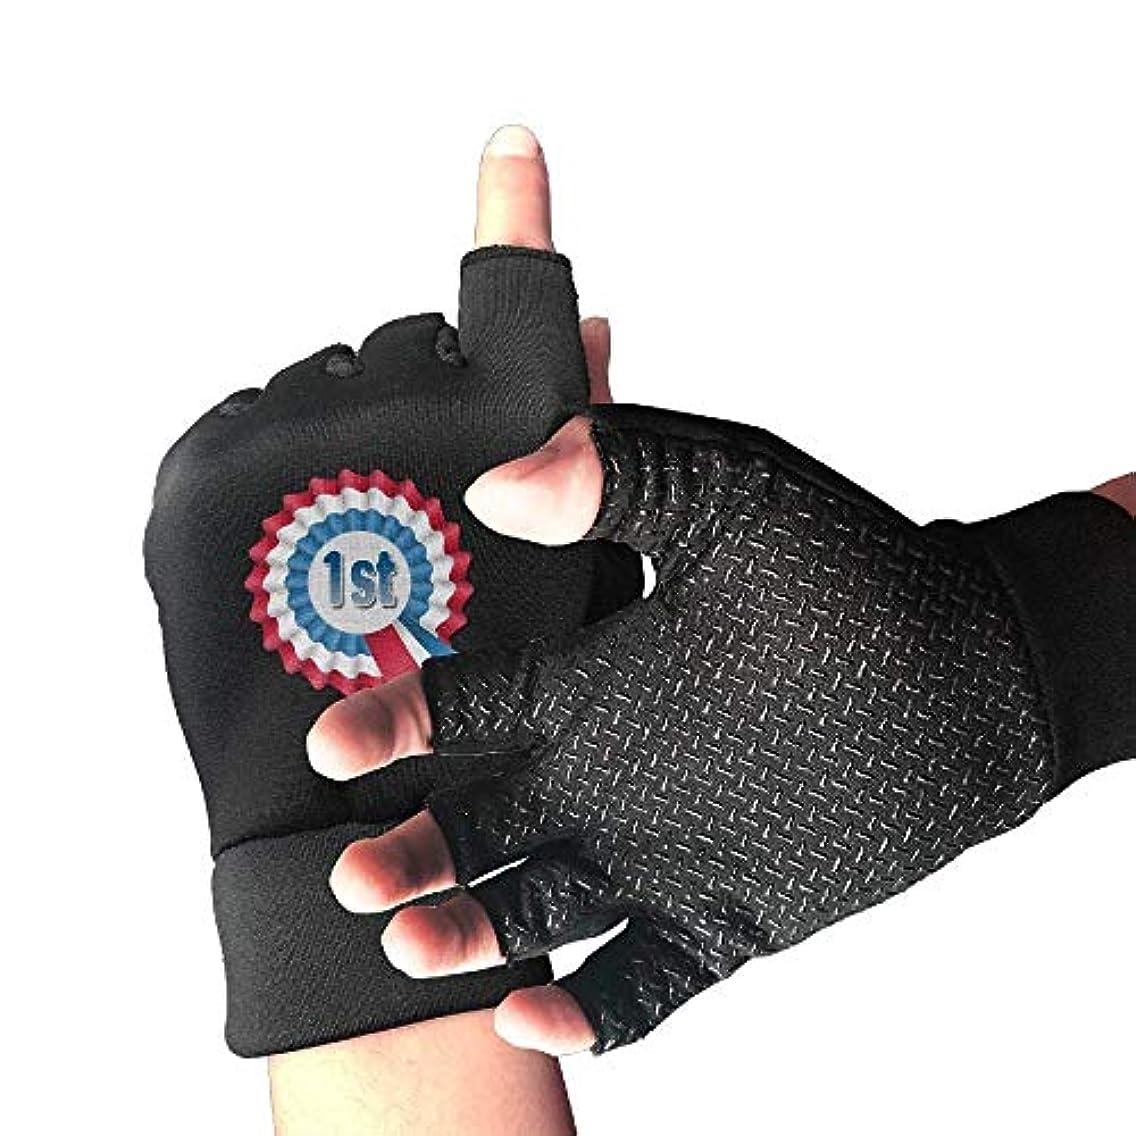 信条島神経Cycling Gloves Award Ribbon Men's/Women's Mountain Bike Gloves Half Finger Anti-Slip Motorcycle Gloves